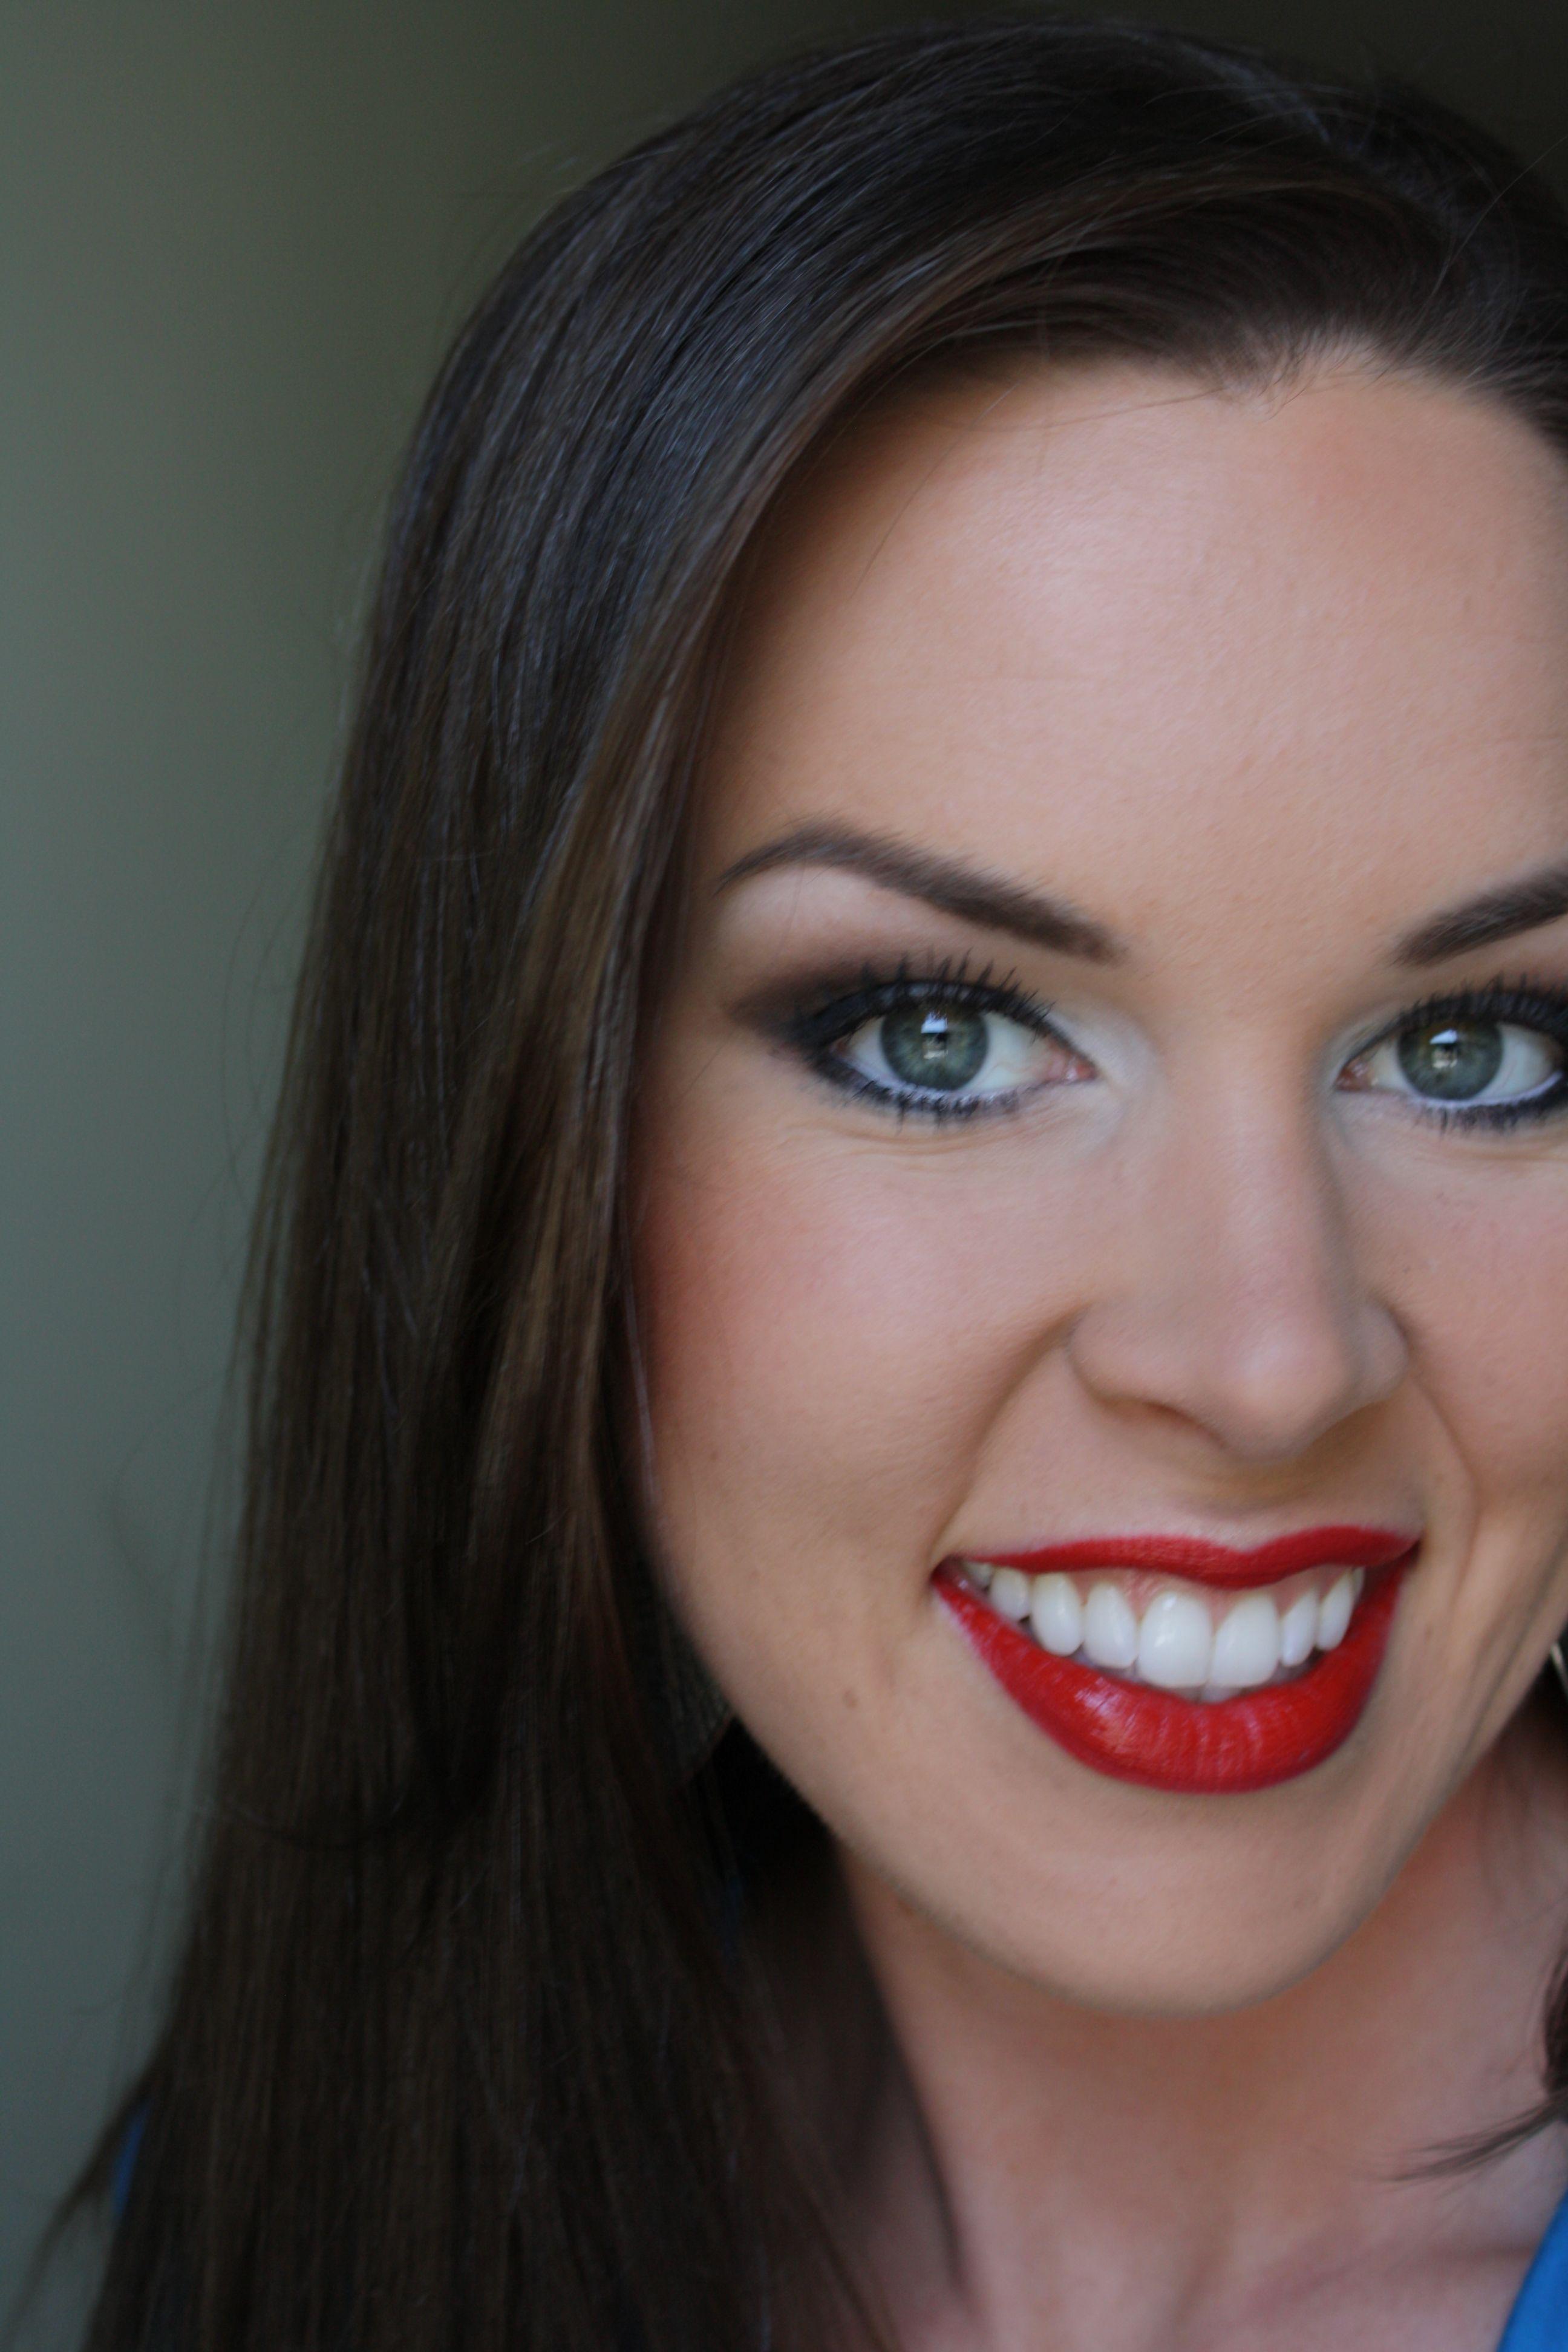 4th of July Makeup & more makeup tutorials